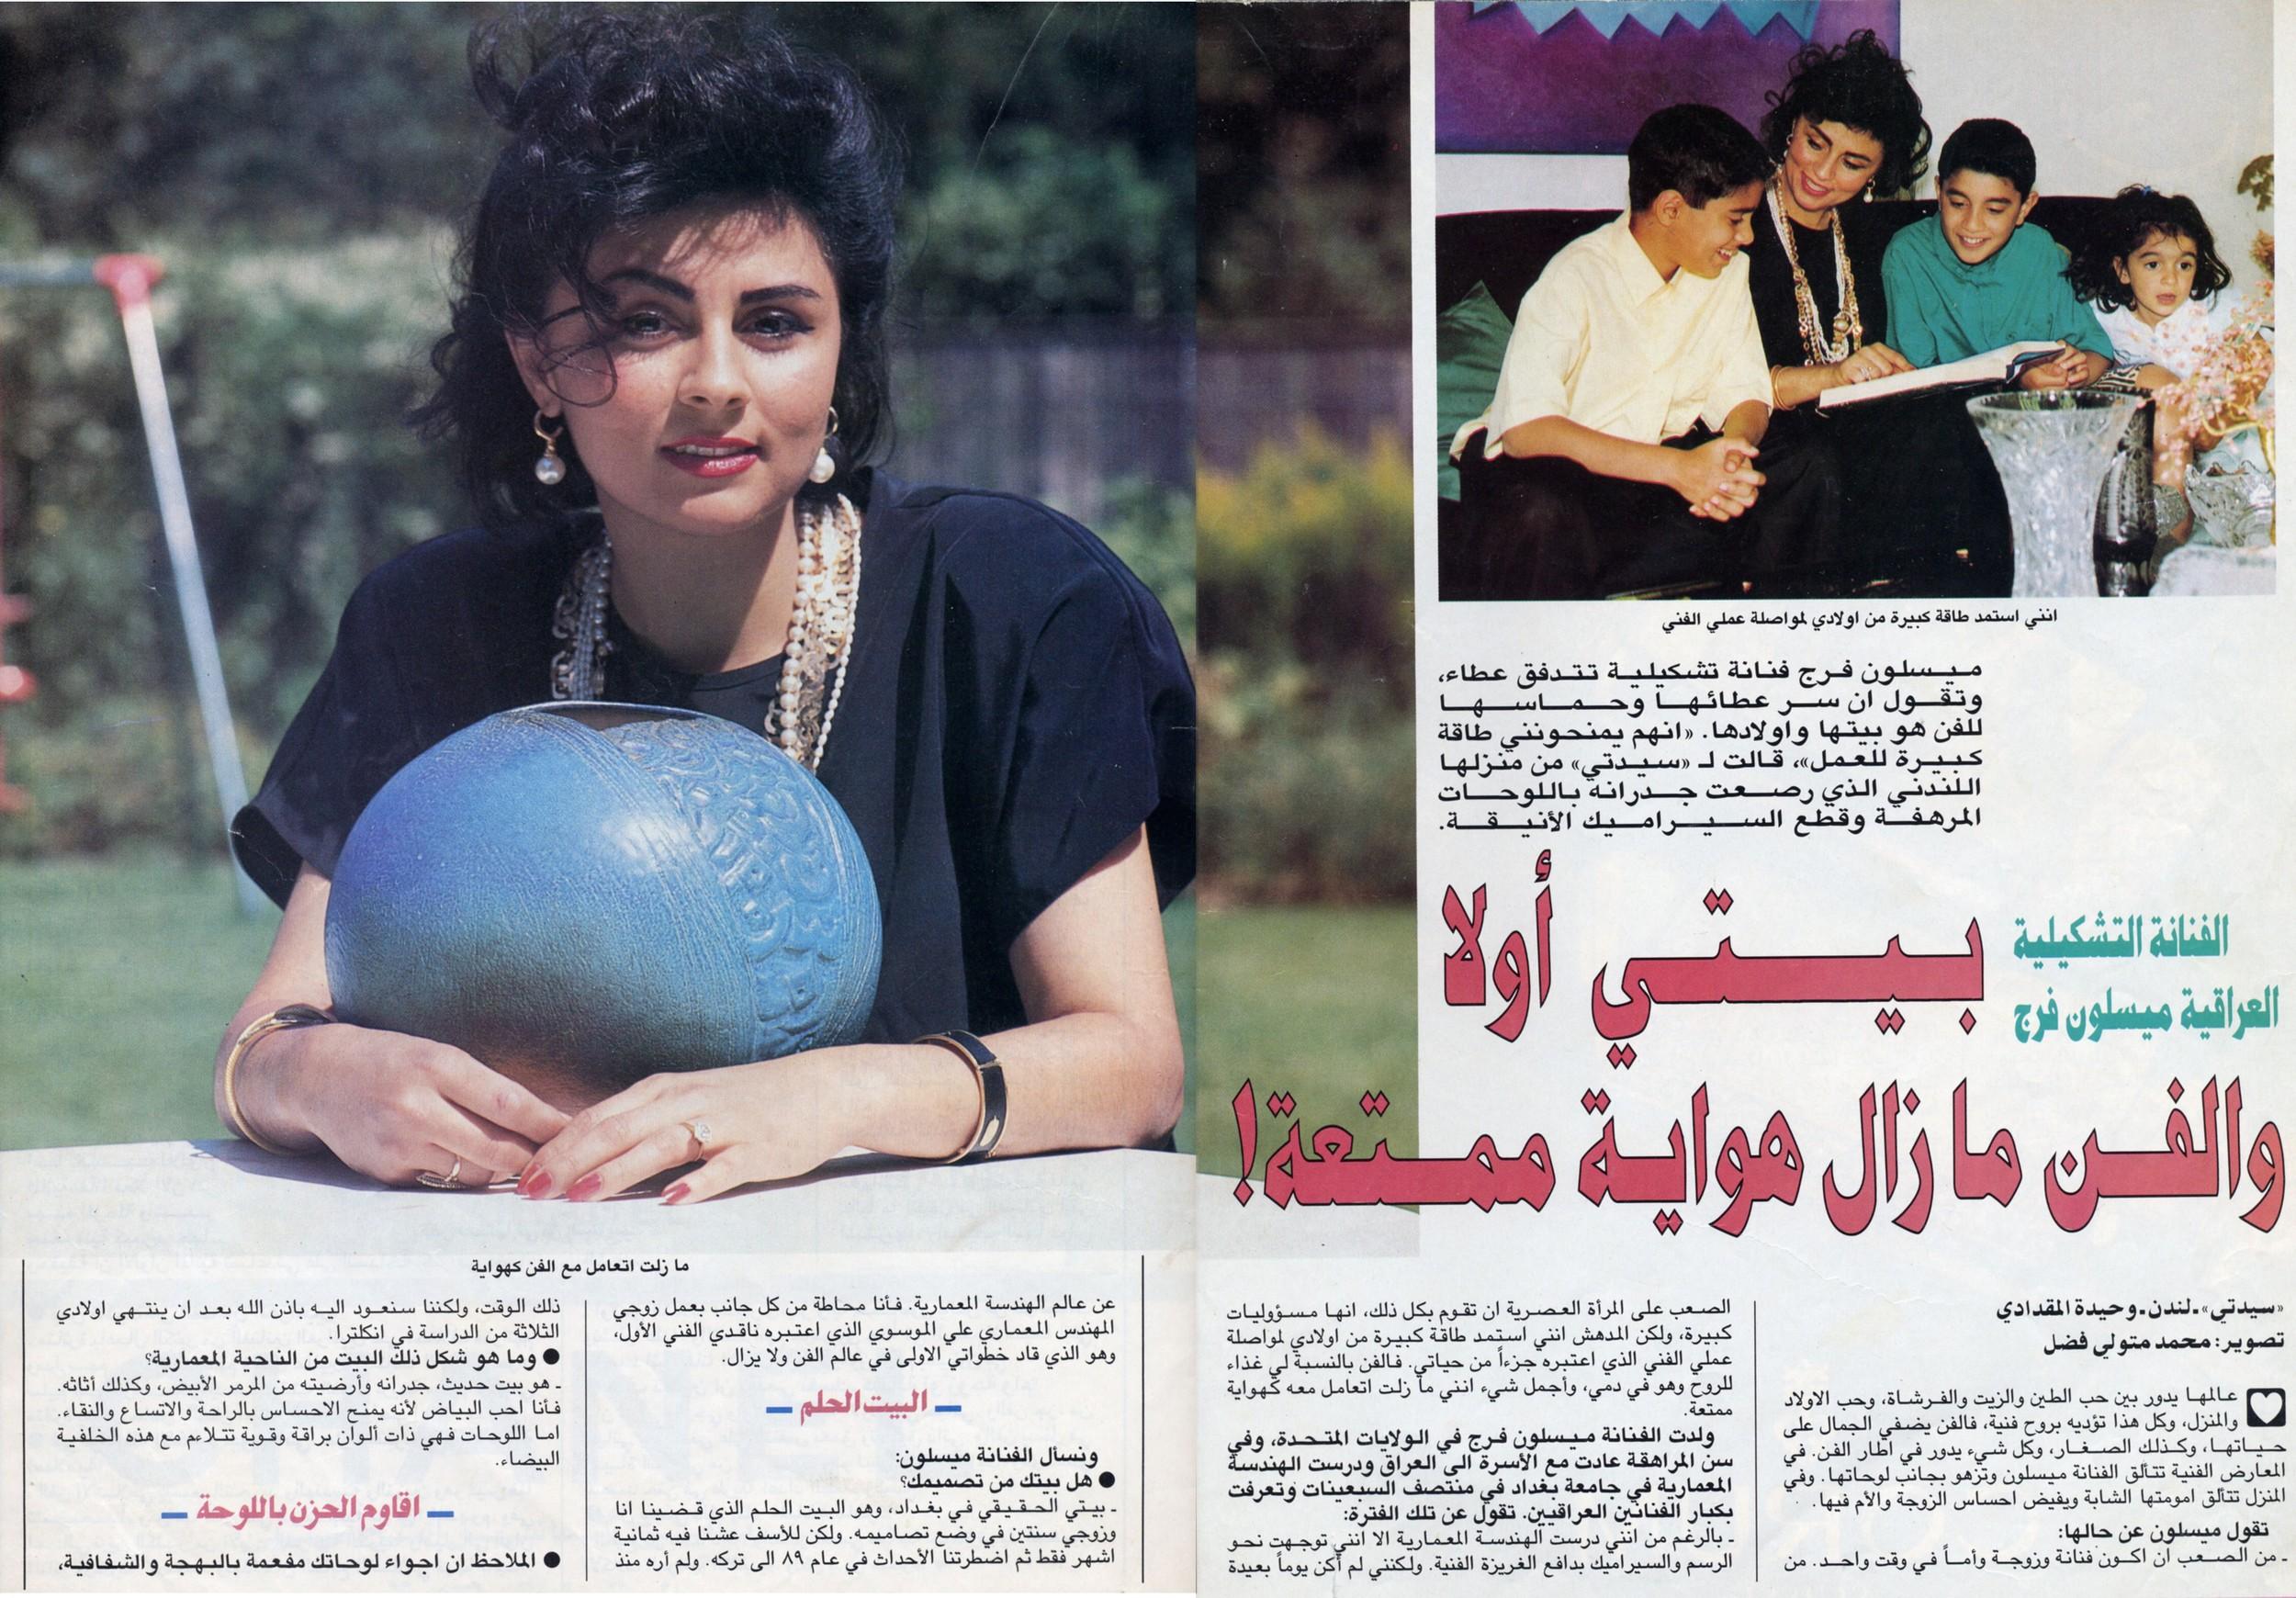 Sayyidaty   by Waheeda al-Miqdadi London 1992